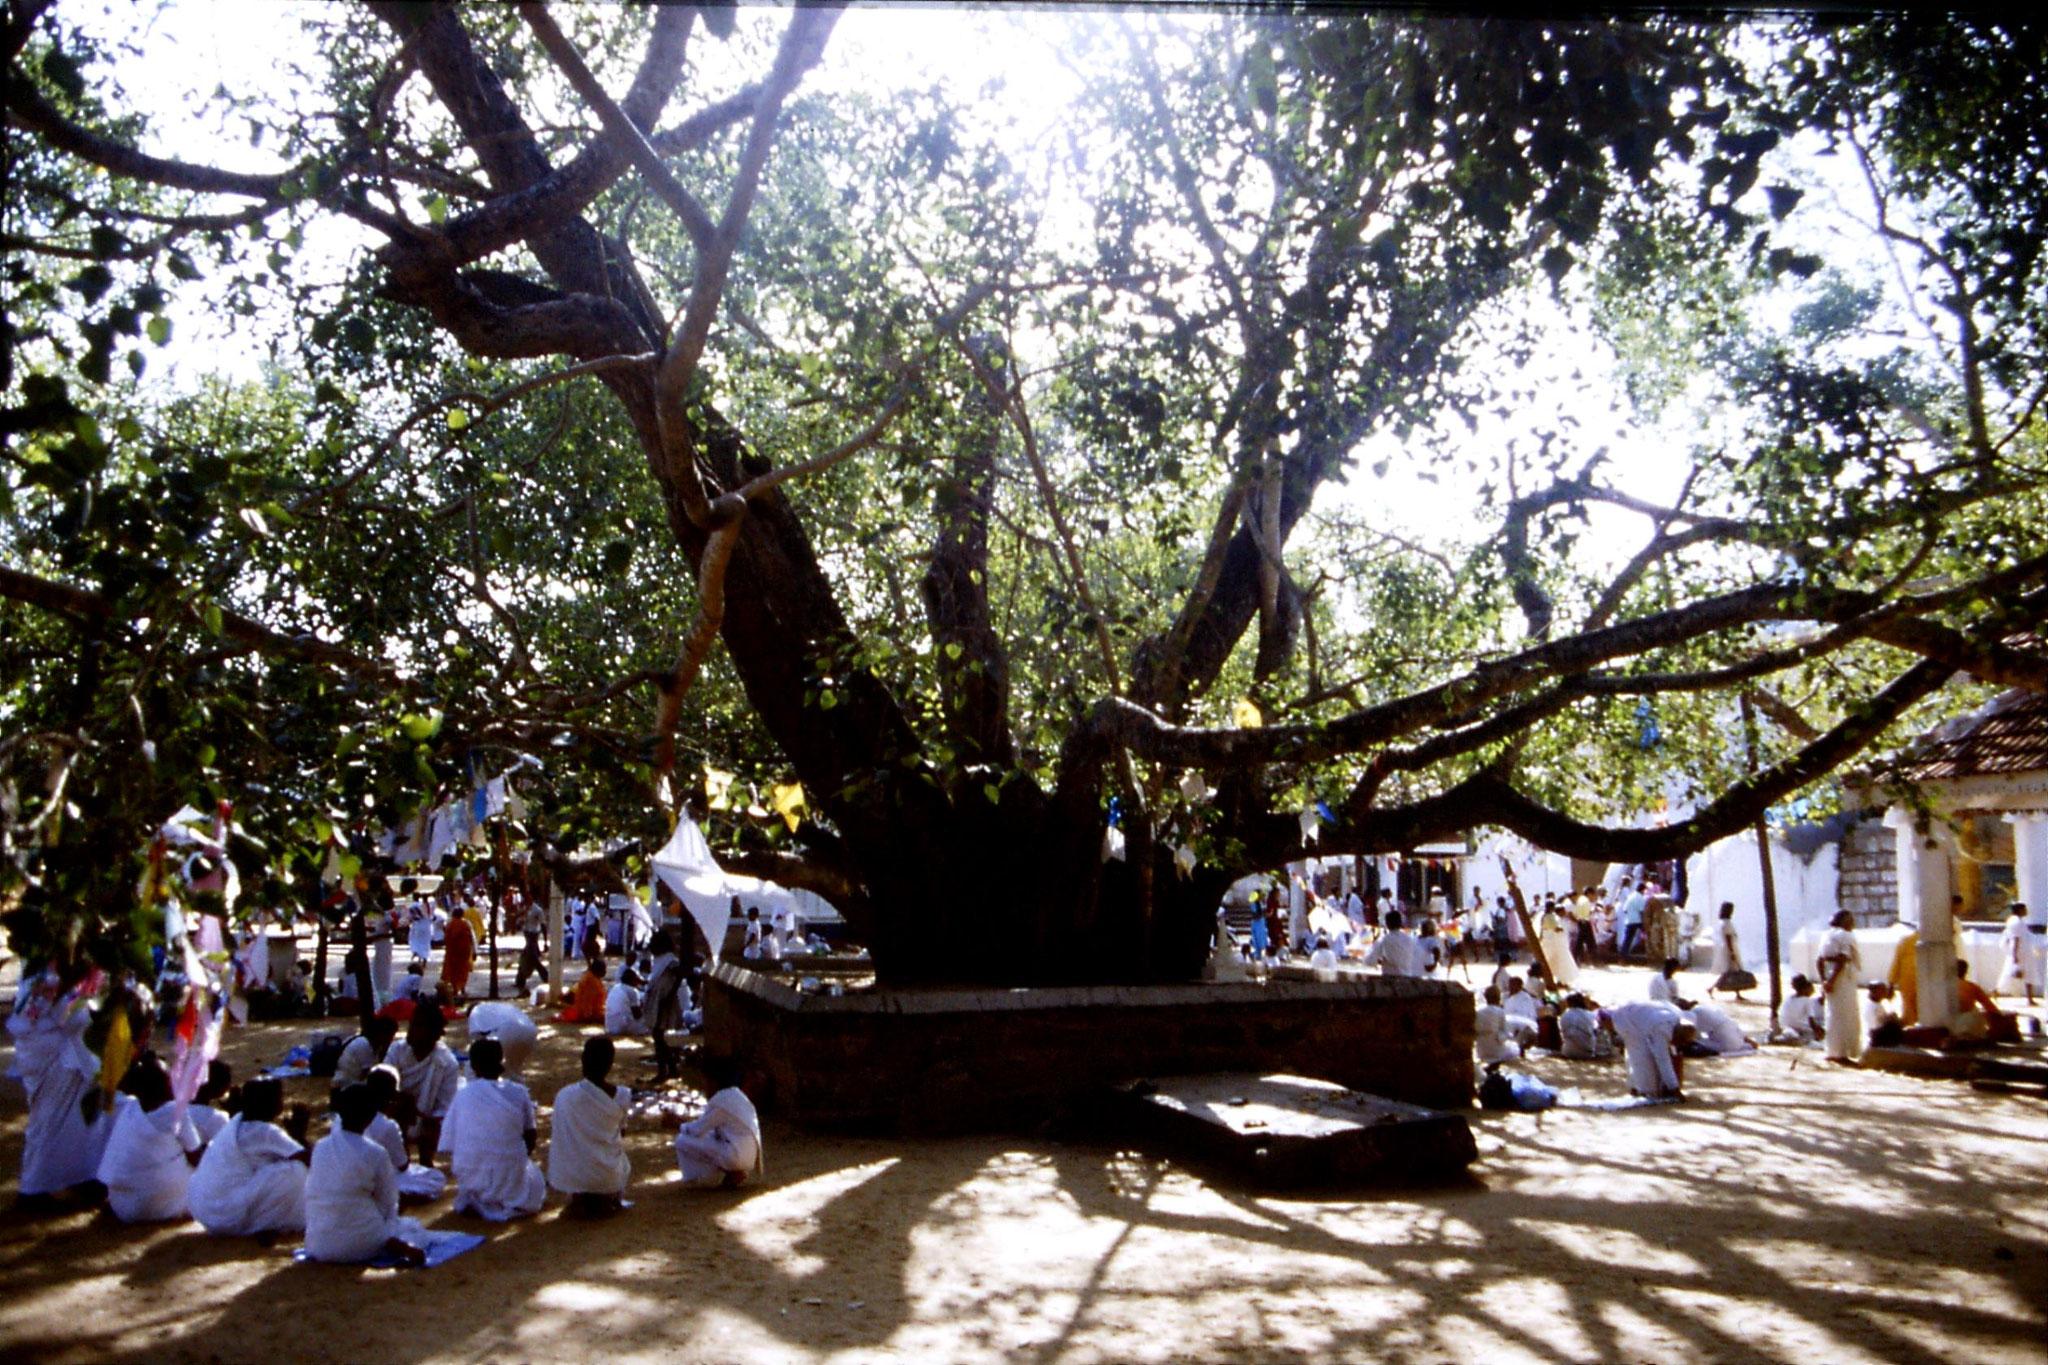 103/5: 9/2/1990 Anuradhapura. Pilgrims under Bo tree